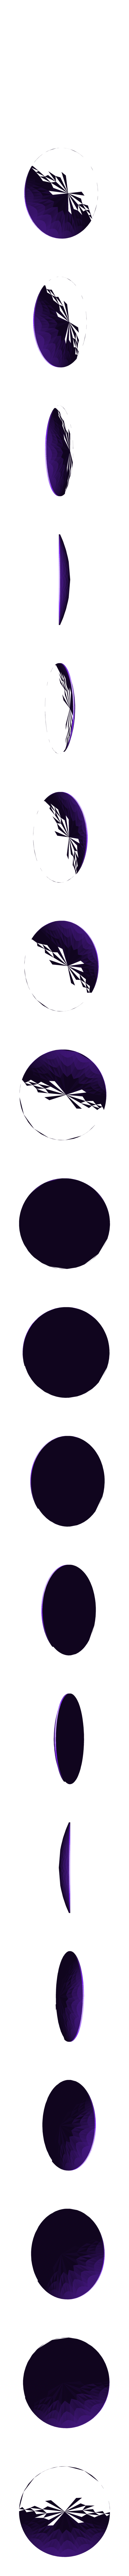 orange_spot_inner_x8.stl Download free STL file Wiggler from Mario games - multi-color • Template to 3D print, bpitanga